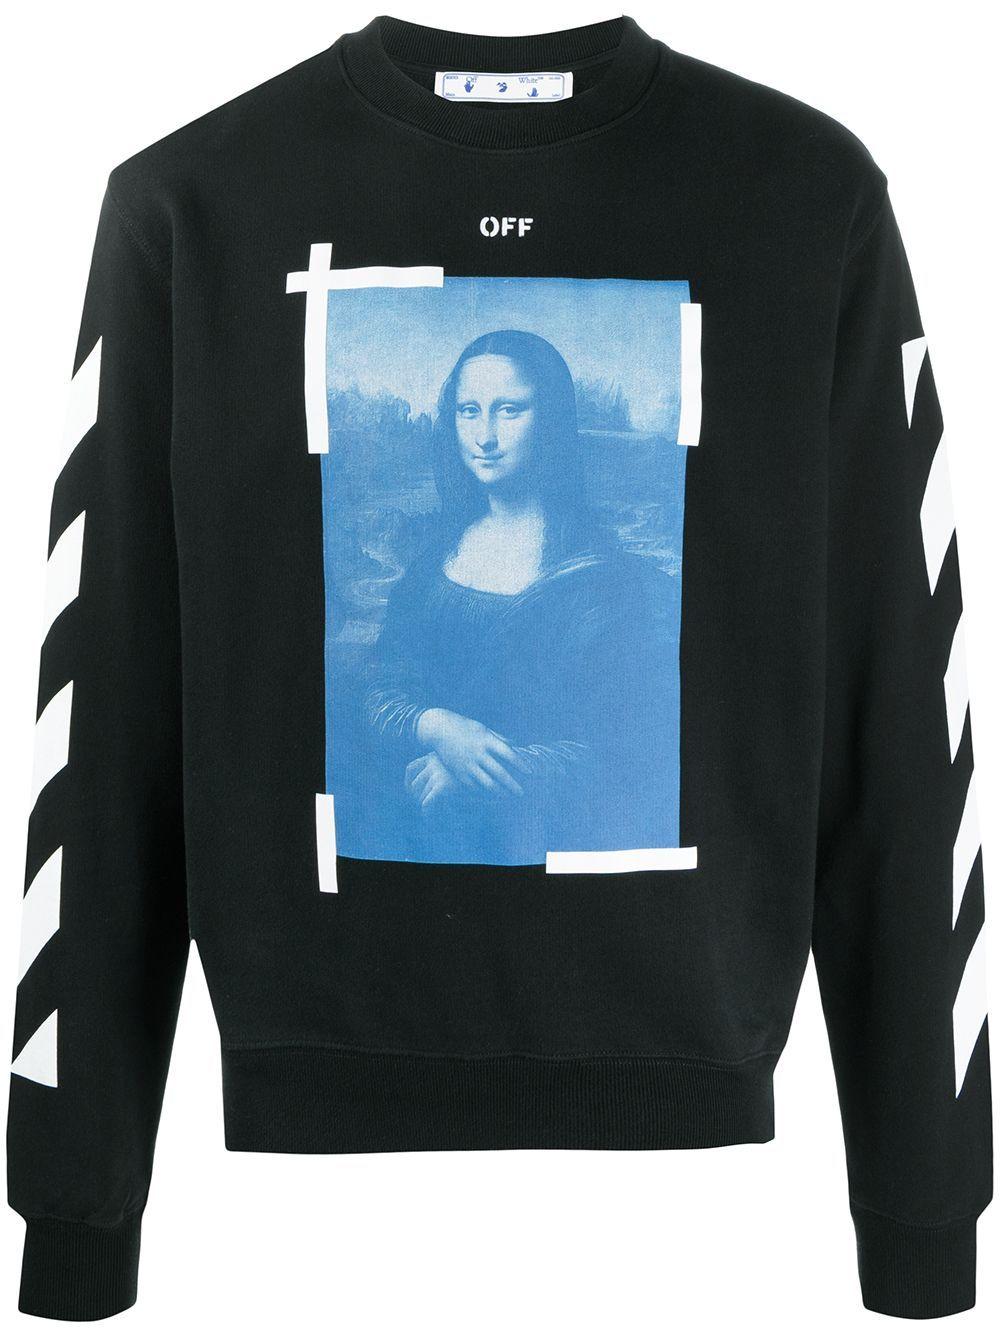 Off White Mona Lisa Print Sweatshirt Farfetch Printed Sweatshirts Graphic Print Sweatshirt Black Cotton Sweatshirt [ 1334 x 1000 Pixel ]